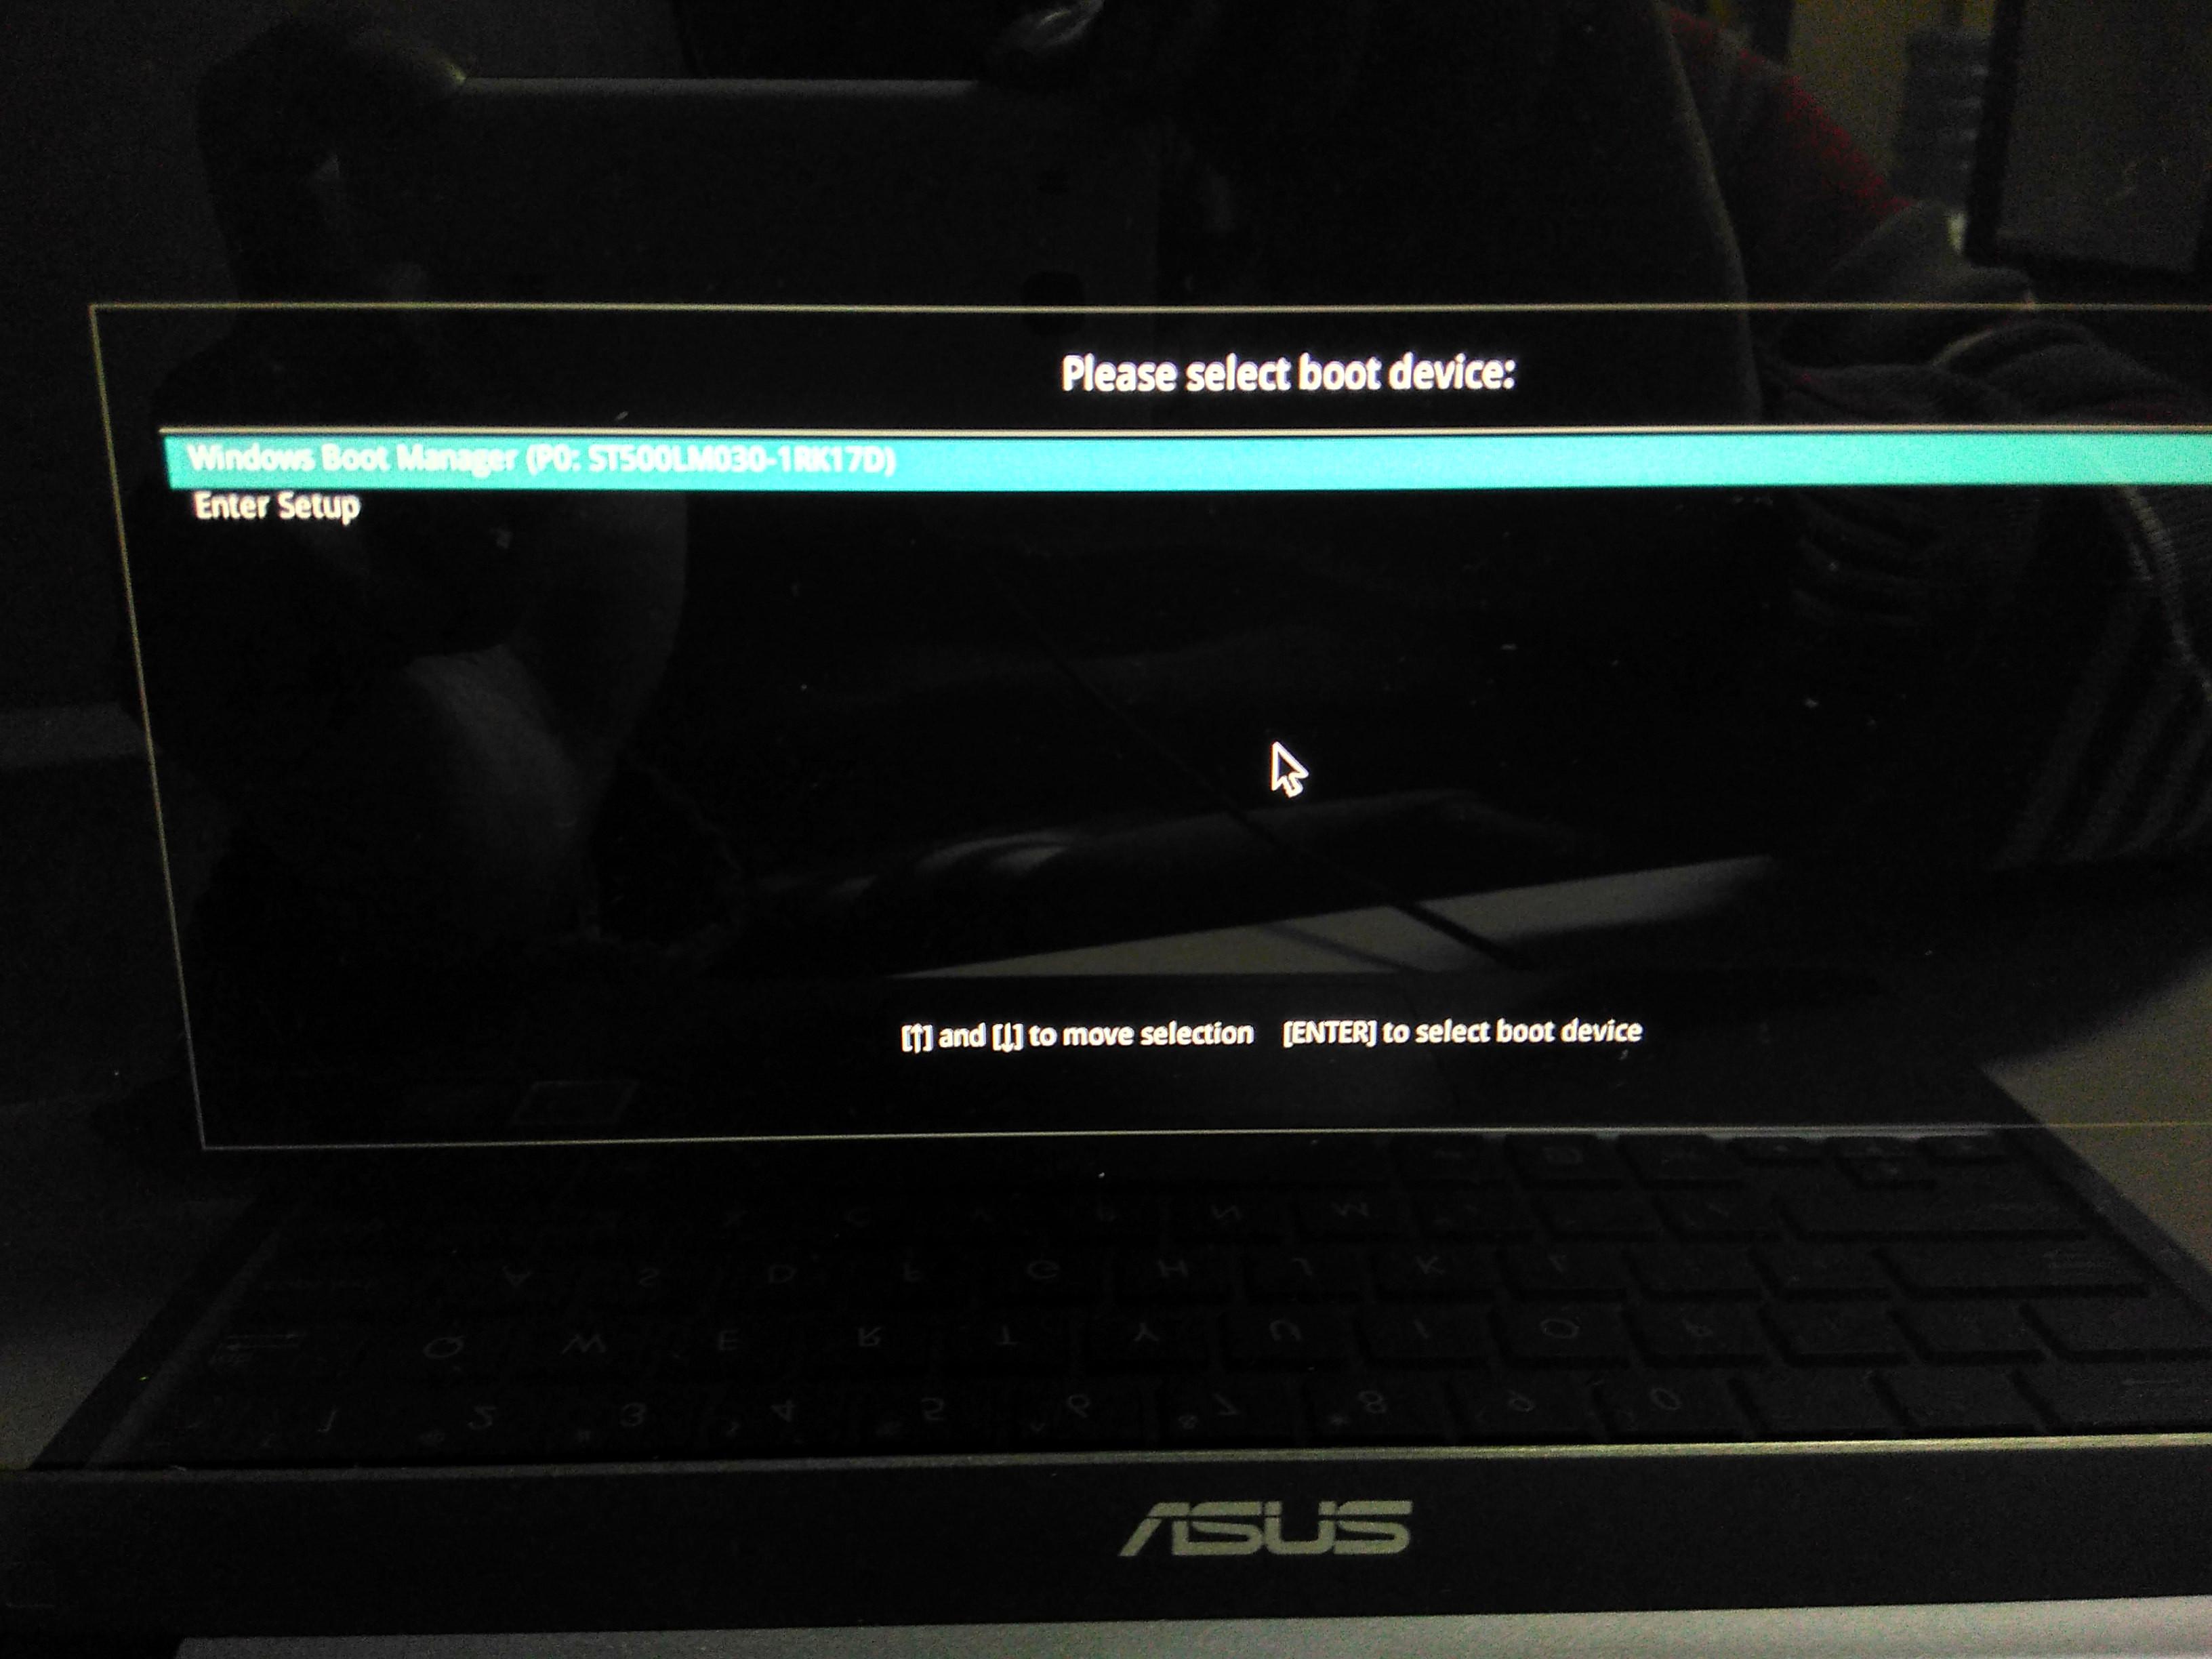 Boot ASUS E203NAH via USB